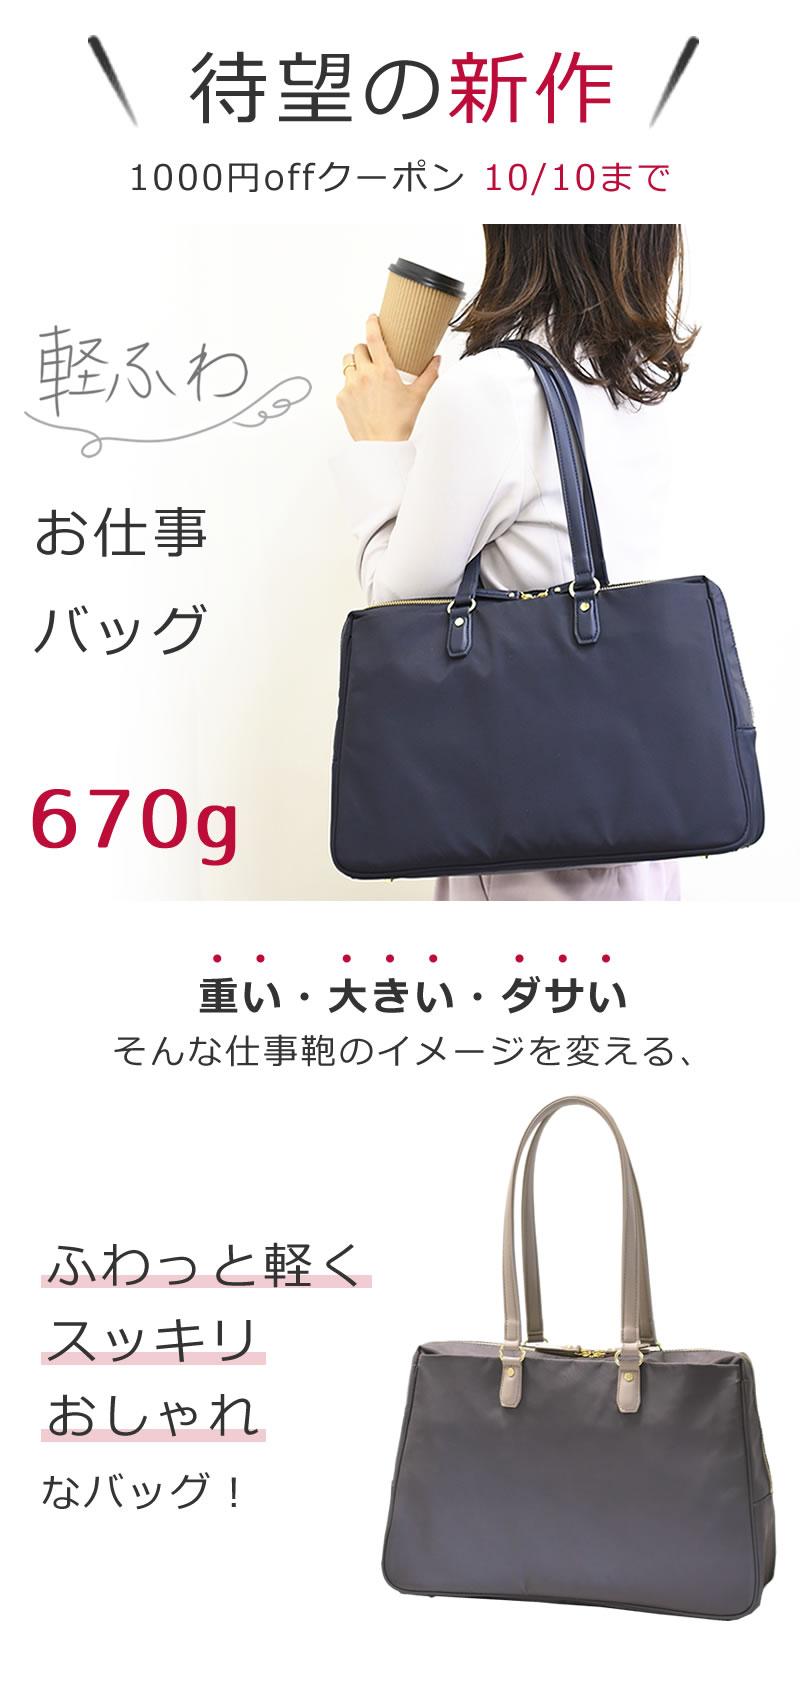 29006紹介